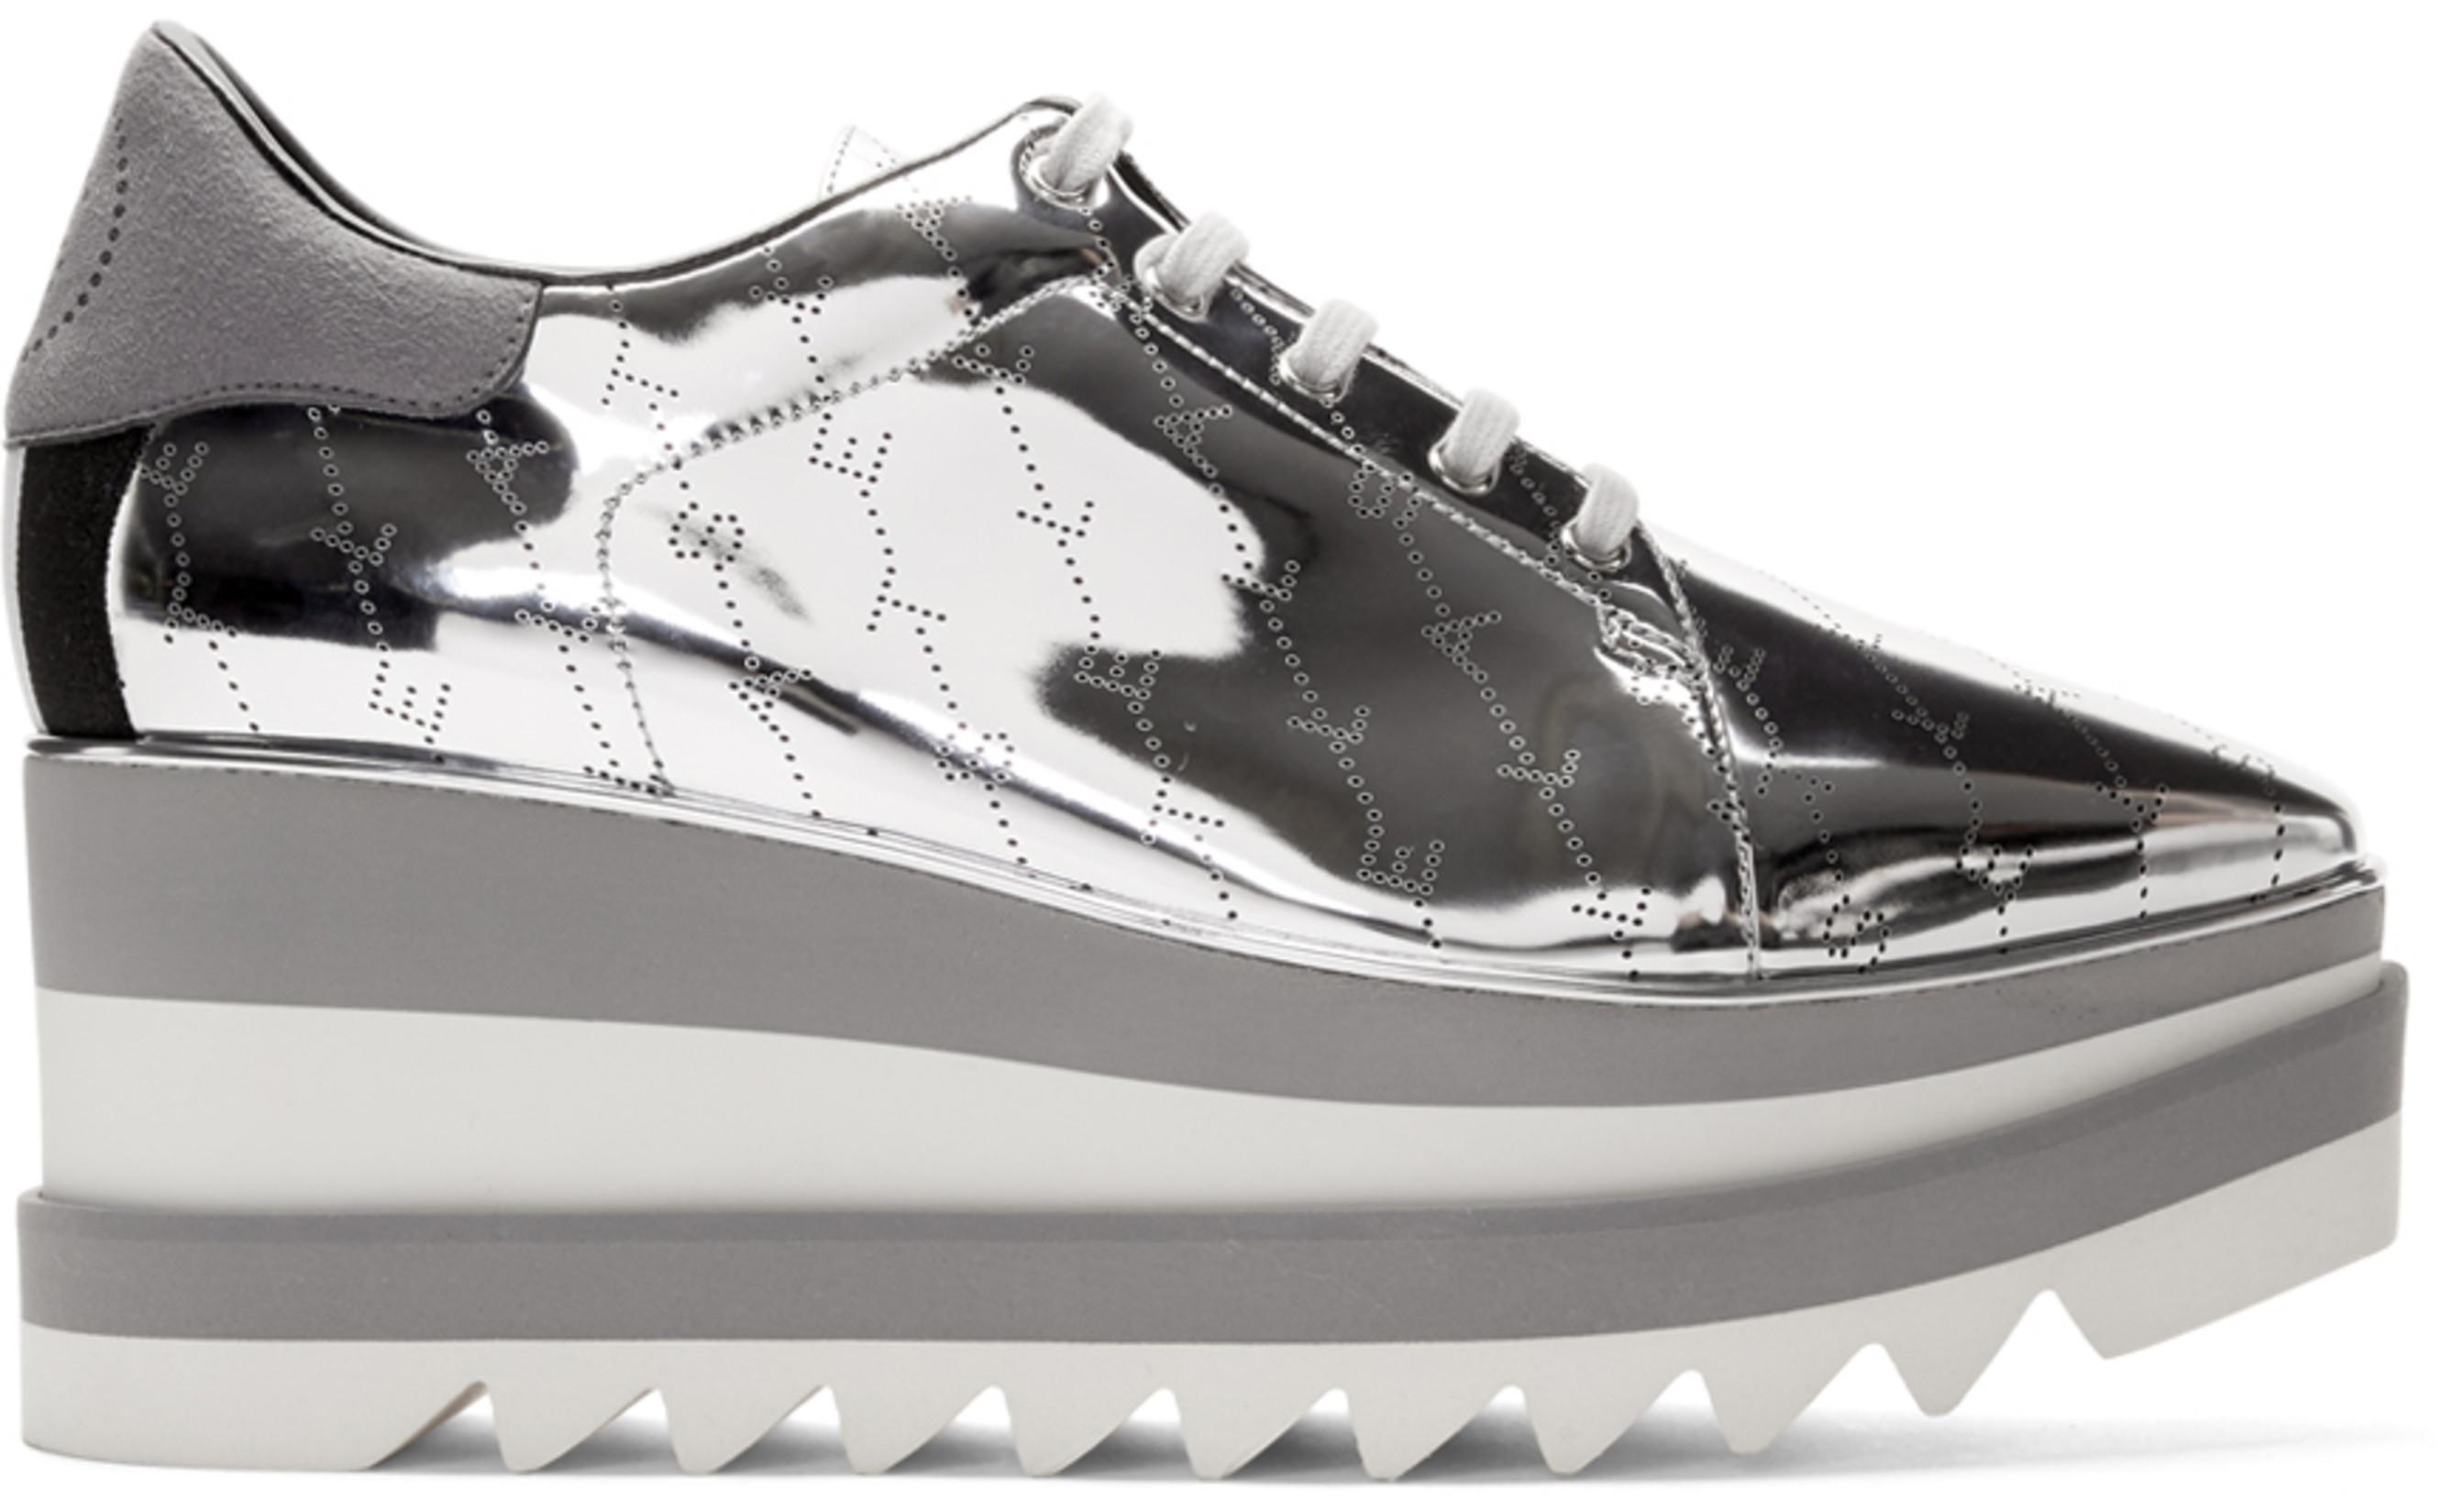 3b18c935713e Stella Mccartney shoes for Women